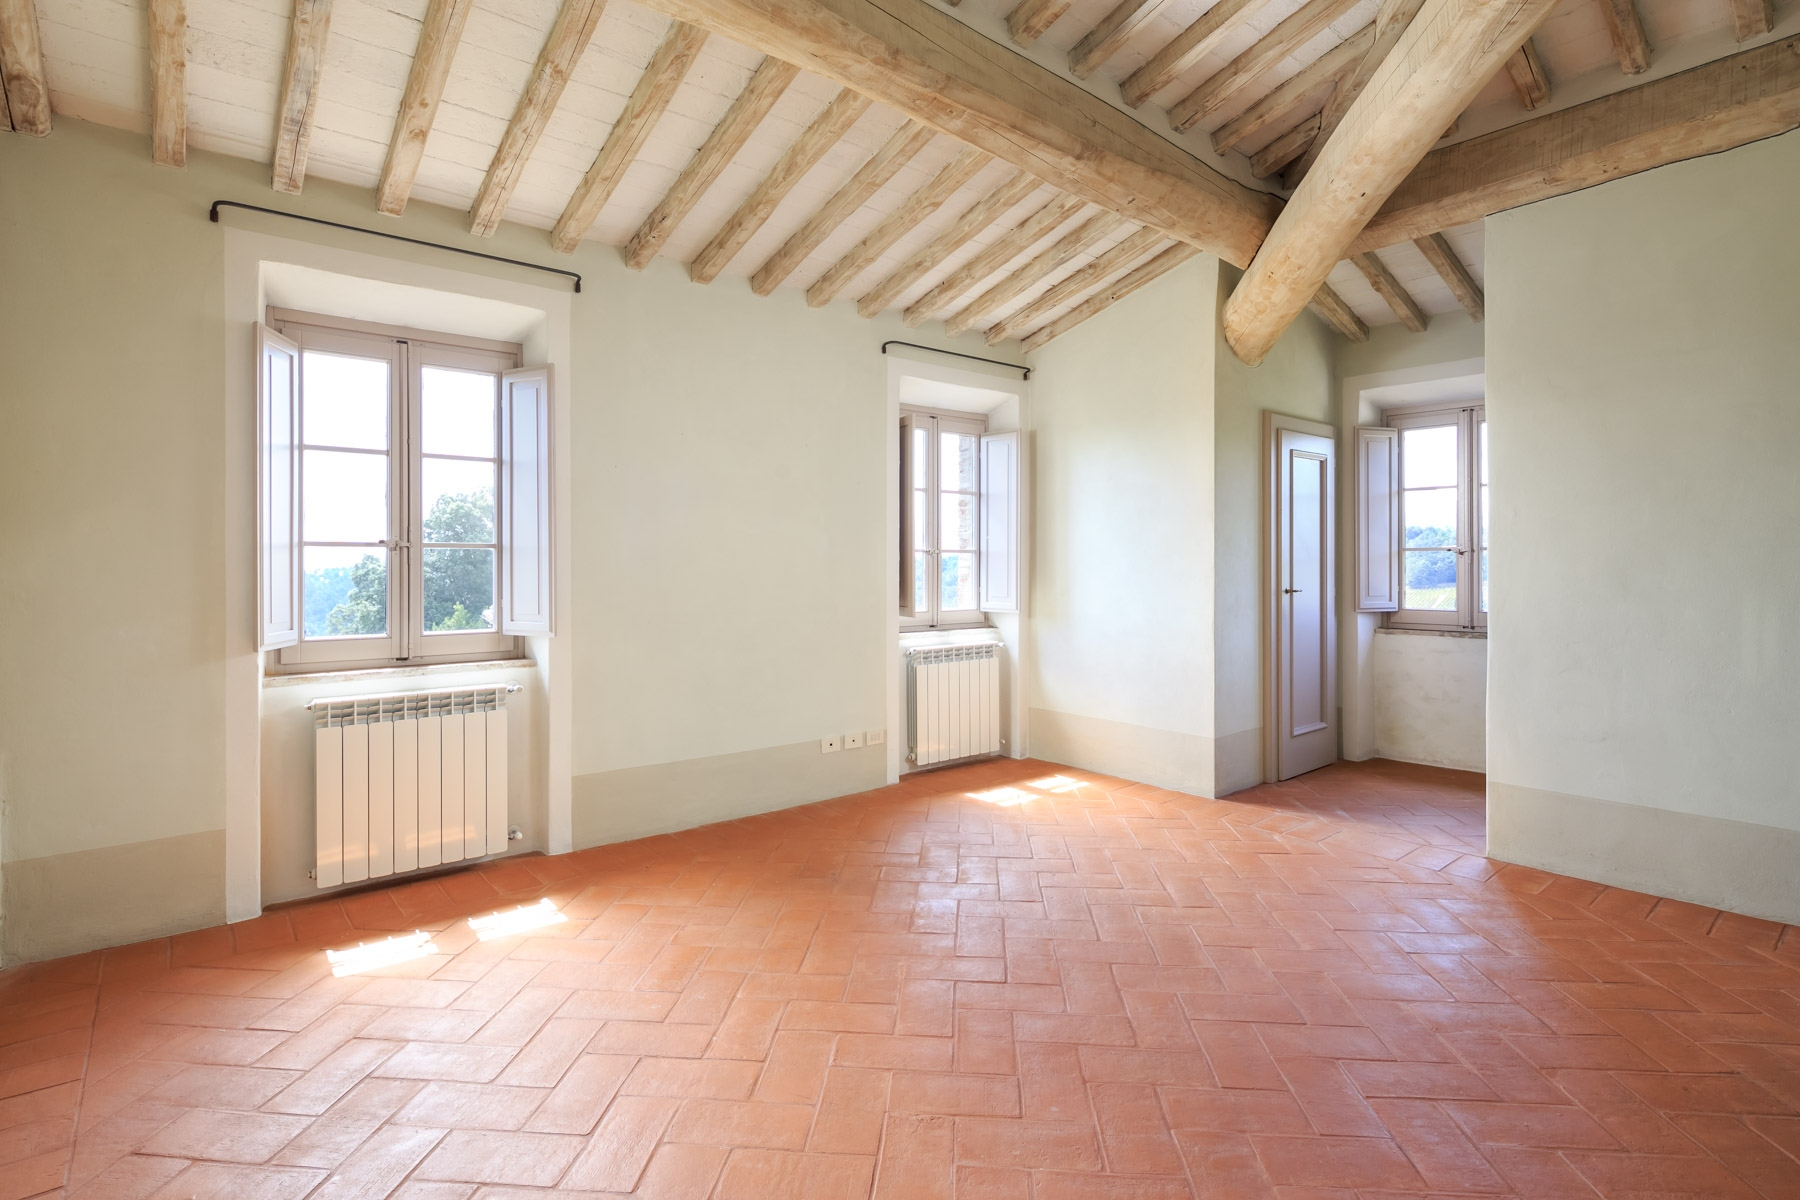 Villa in Vendita a Lucca: 5 locali, 225 mq - Foto 5